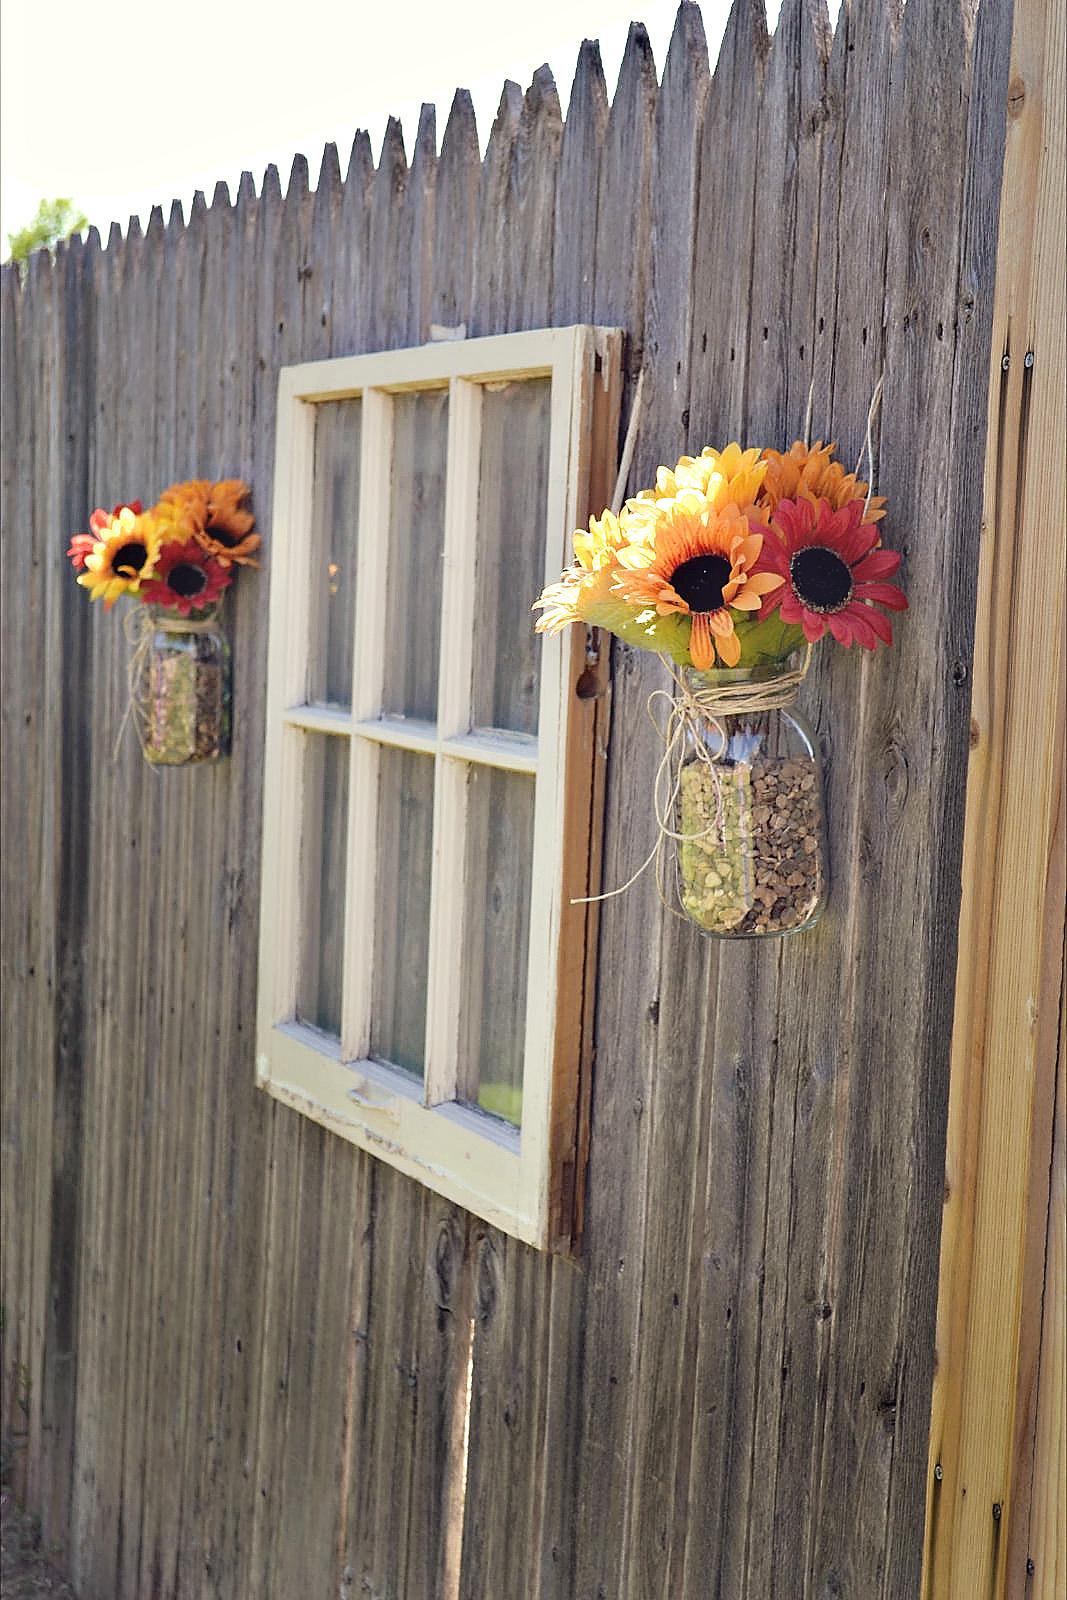 Как украсить забор на даче своими руками фото